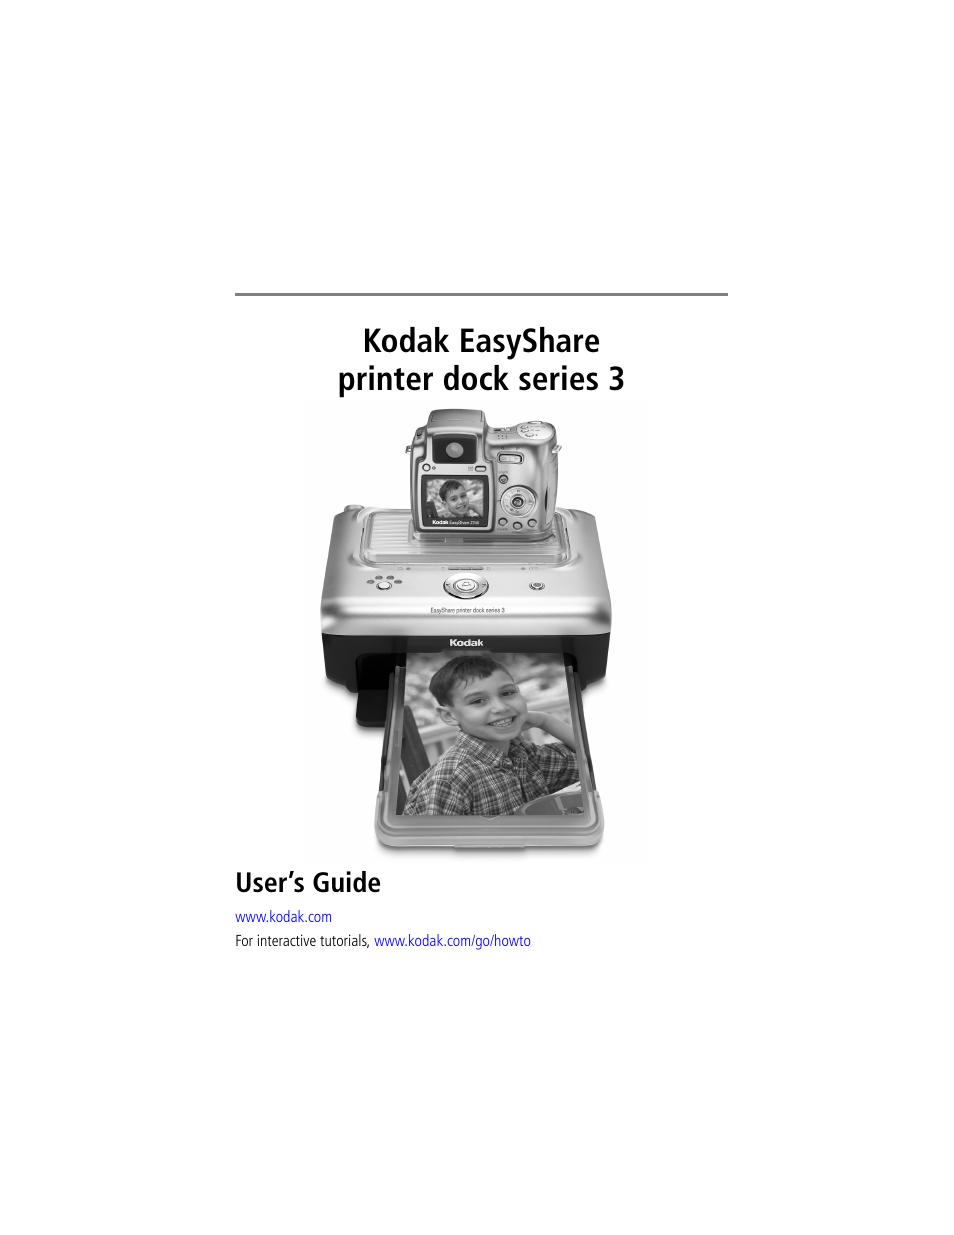 Easyshare Printer Dock Series 3 Color Cartridge : My kodak